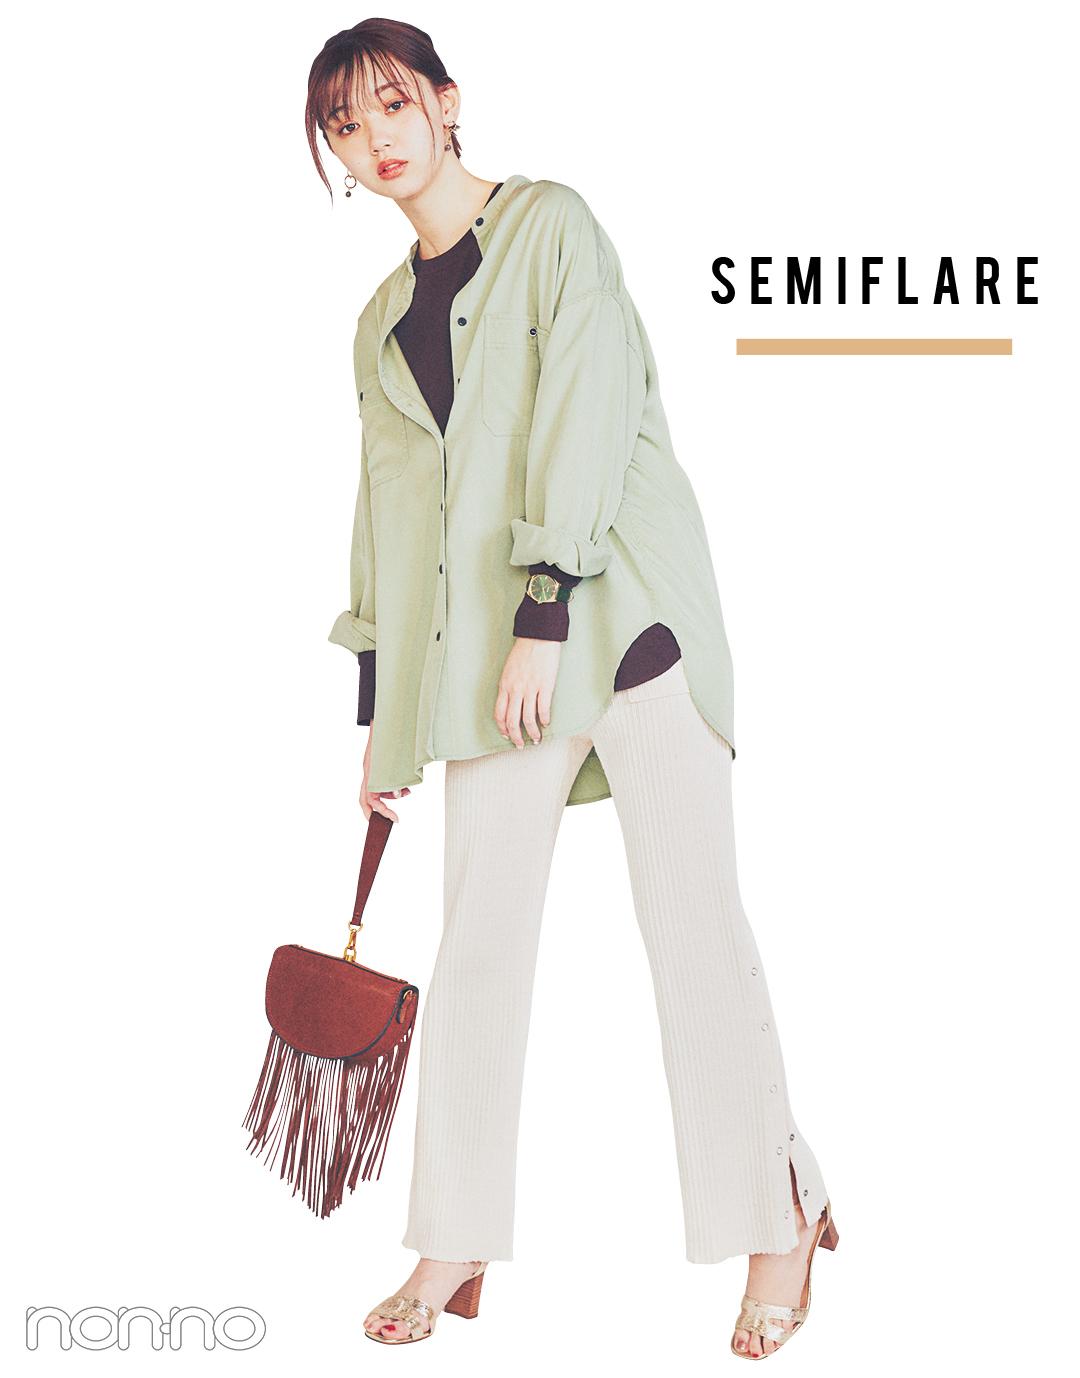 semiflare